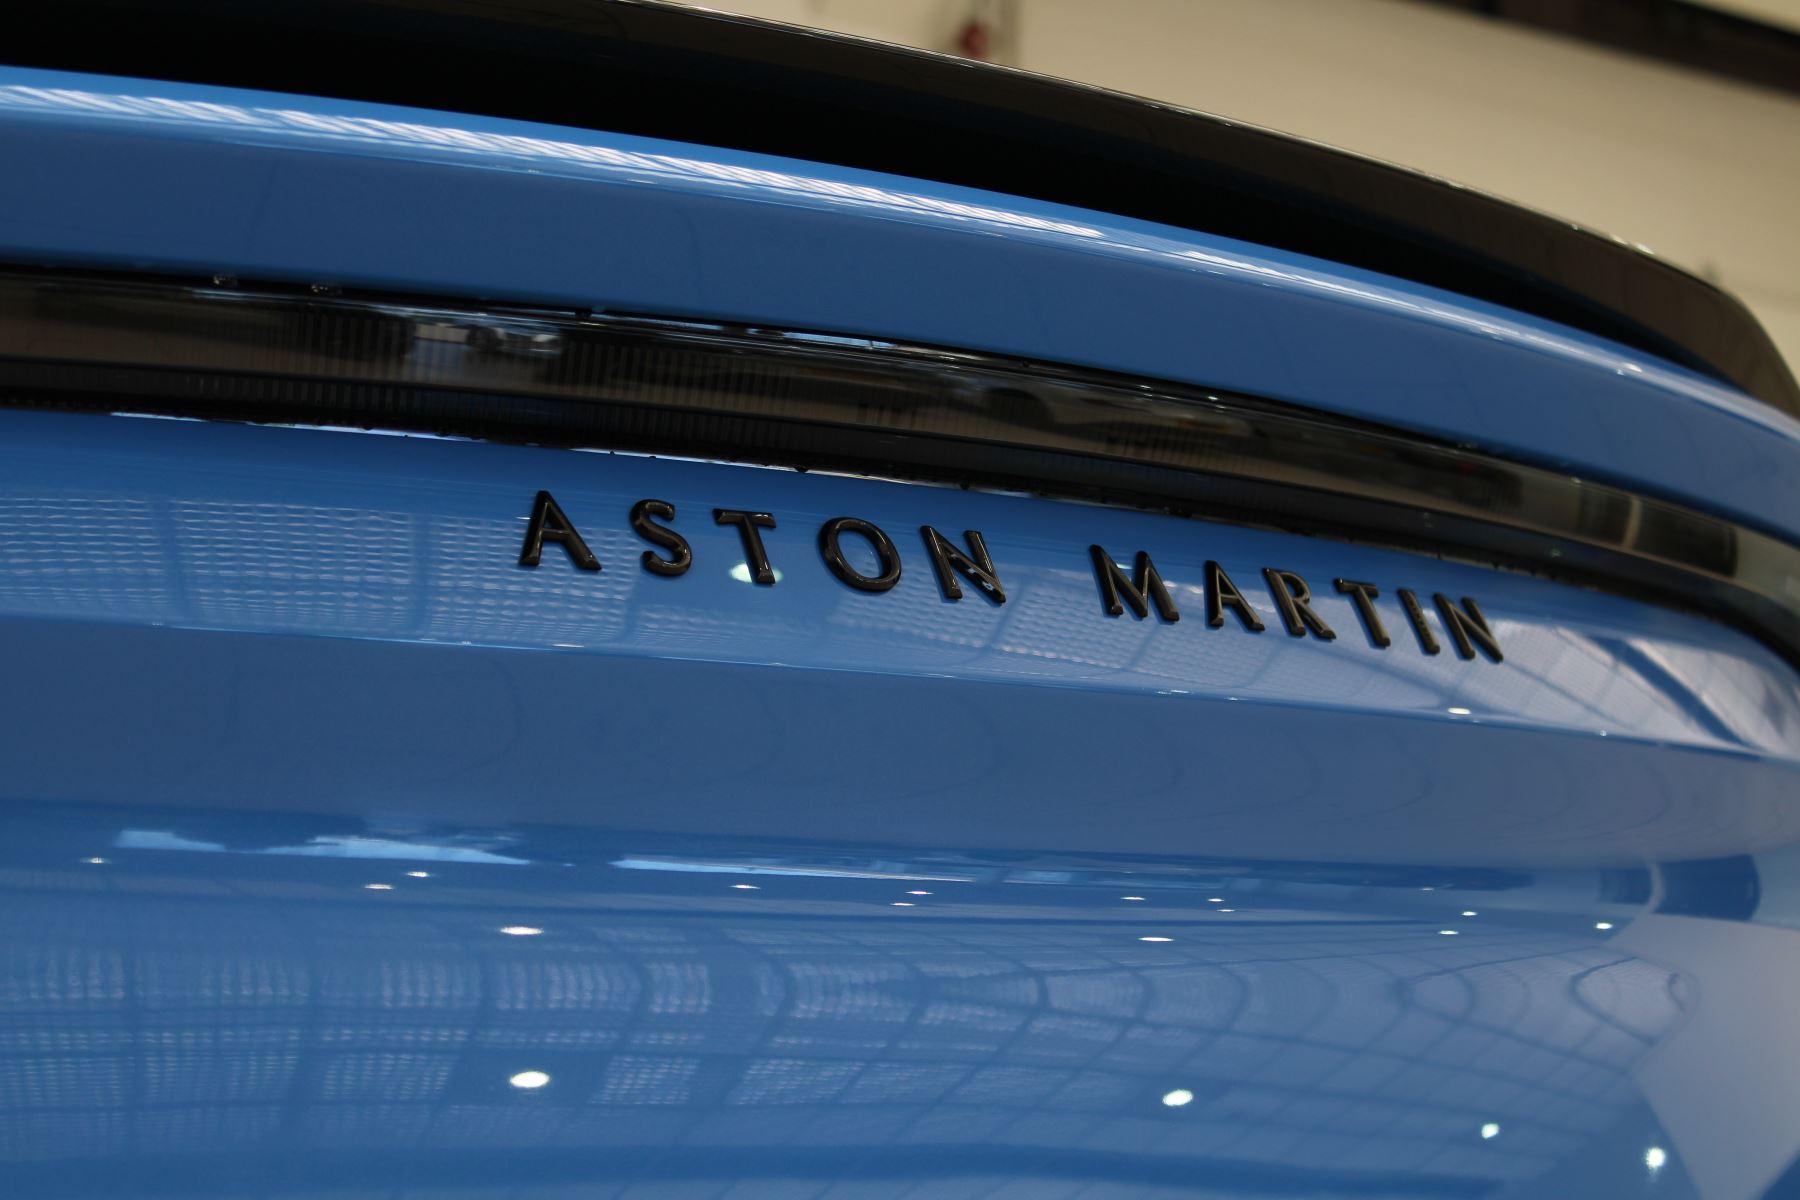 Aston Martin DBS V12 Superleggera Touchtronic Special Ceramic Blue - B&O image 18